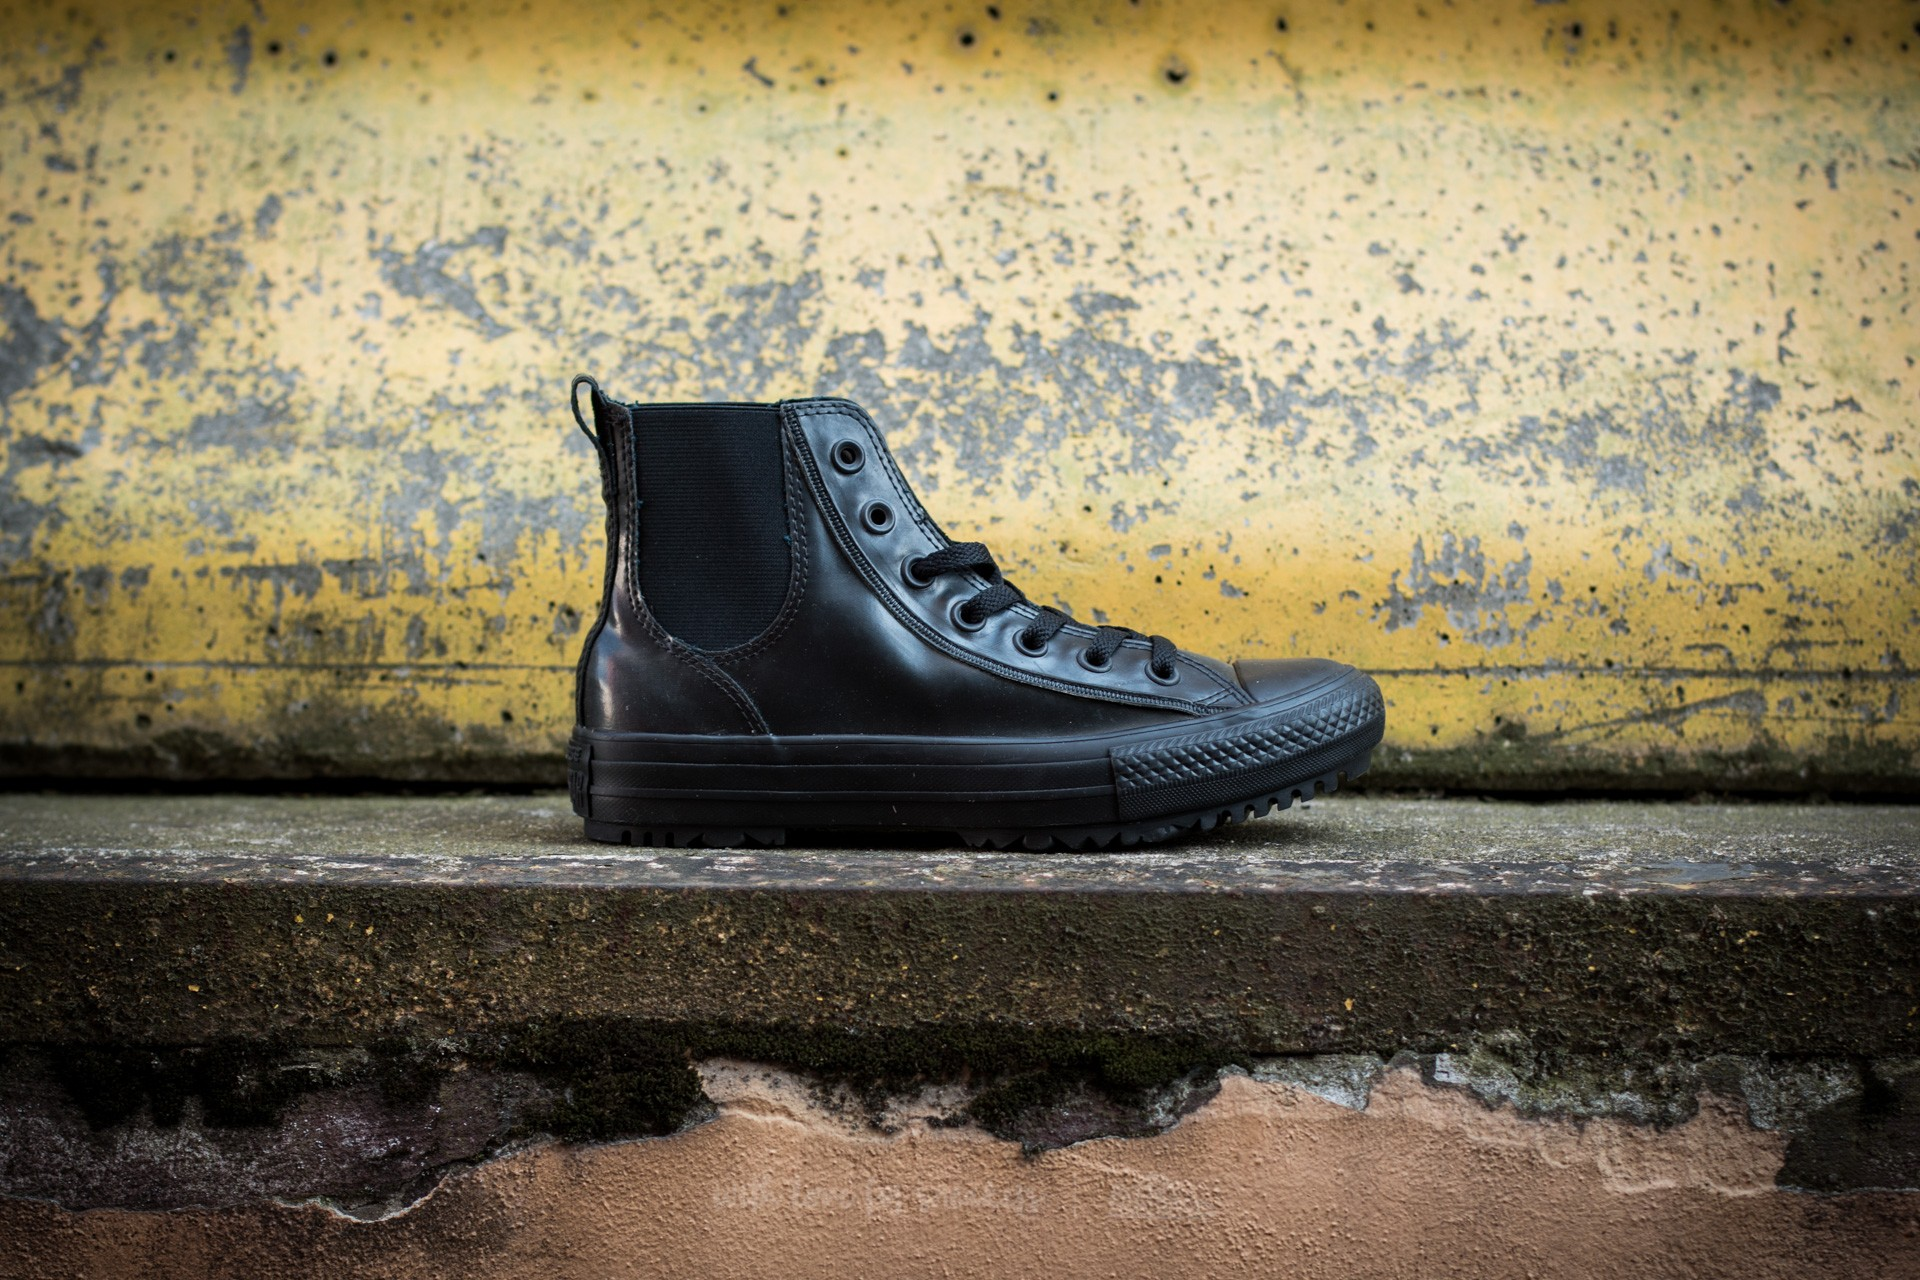 Converse Chuck Taylor All Star Chelsea Boot Rubber Hi Black